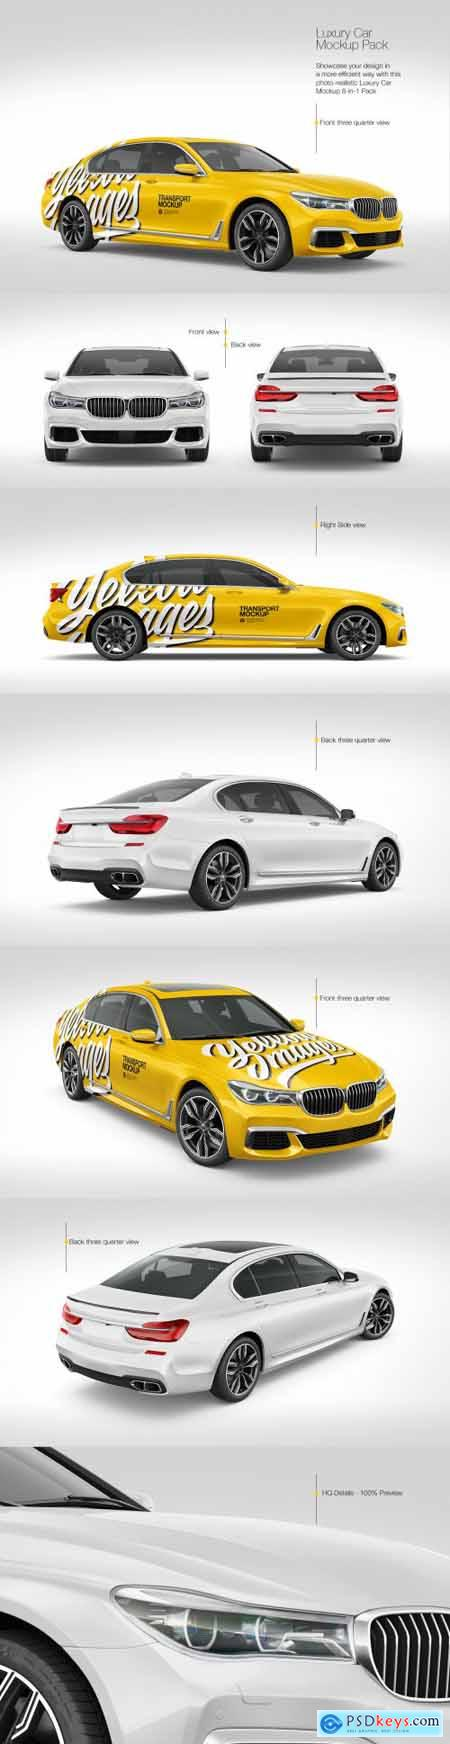 Luxury Car Mockup Pack 69771